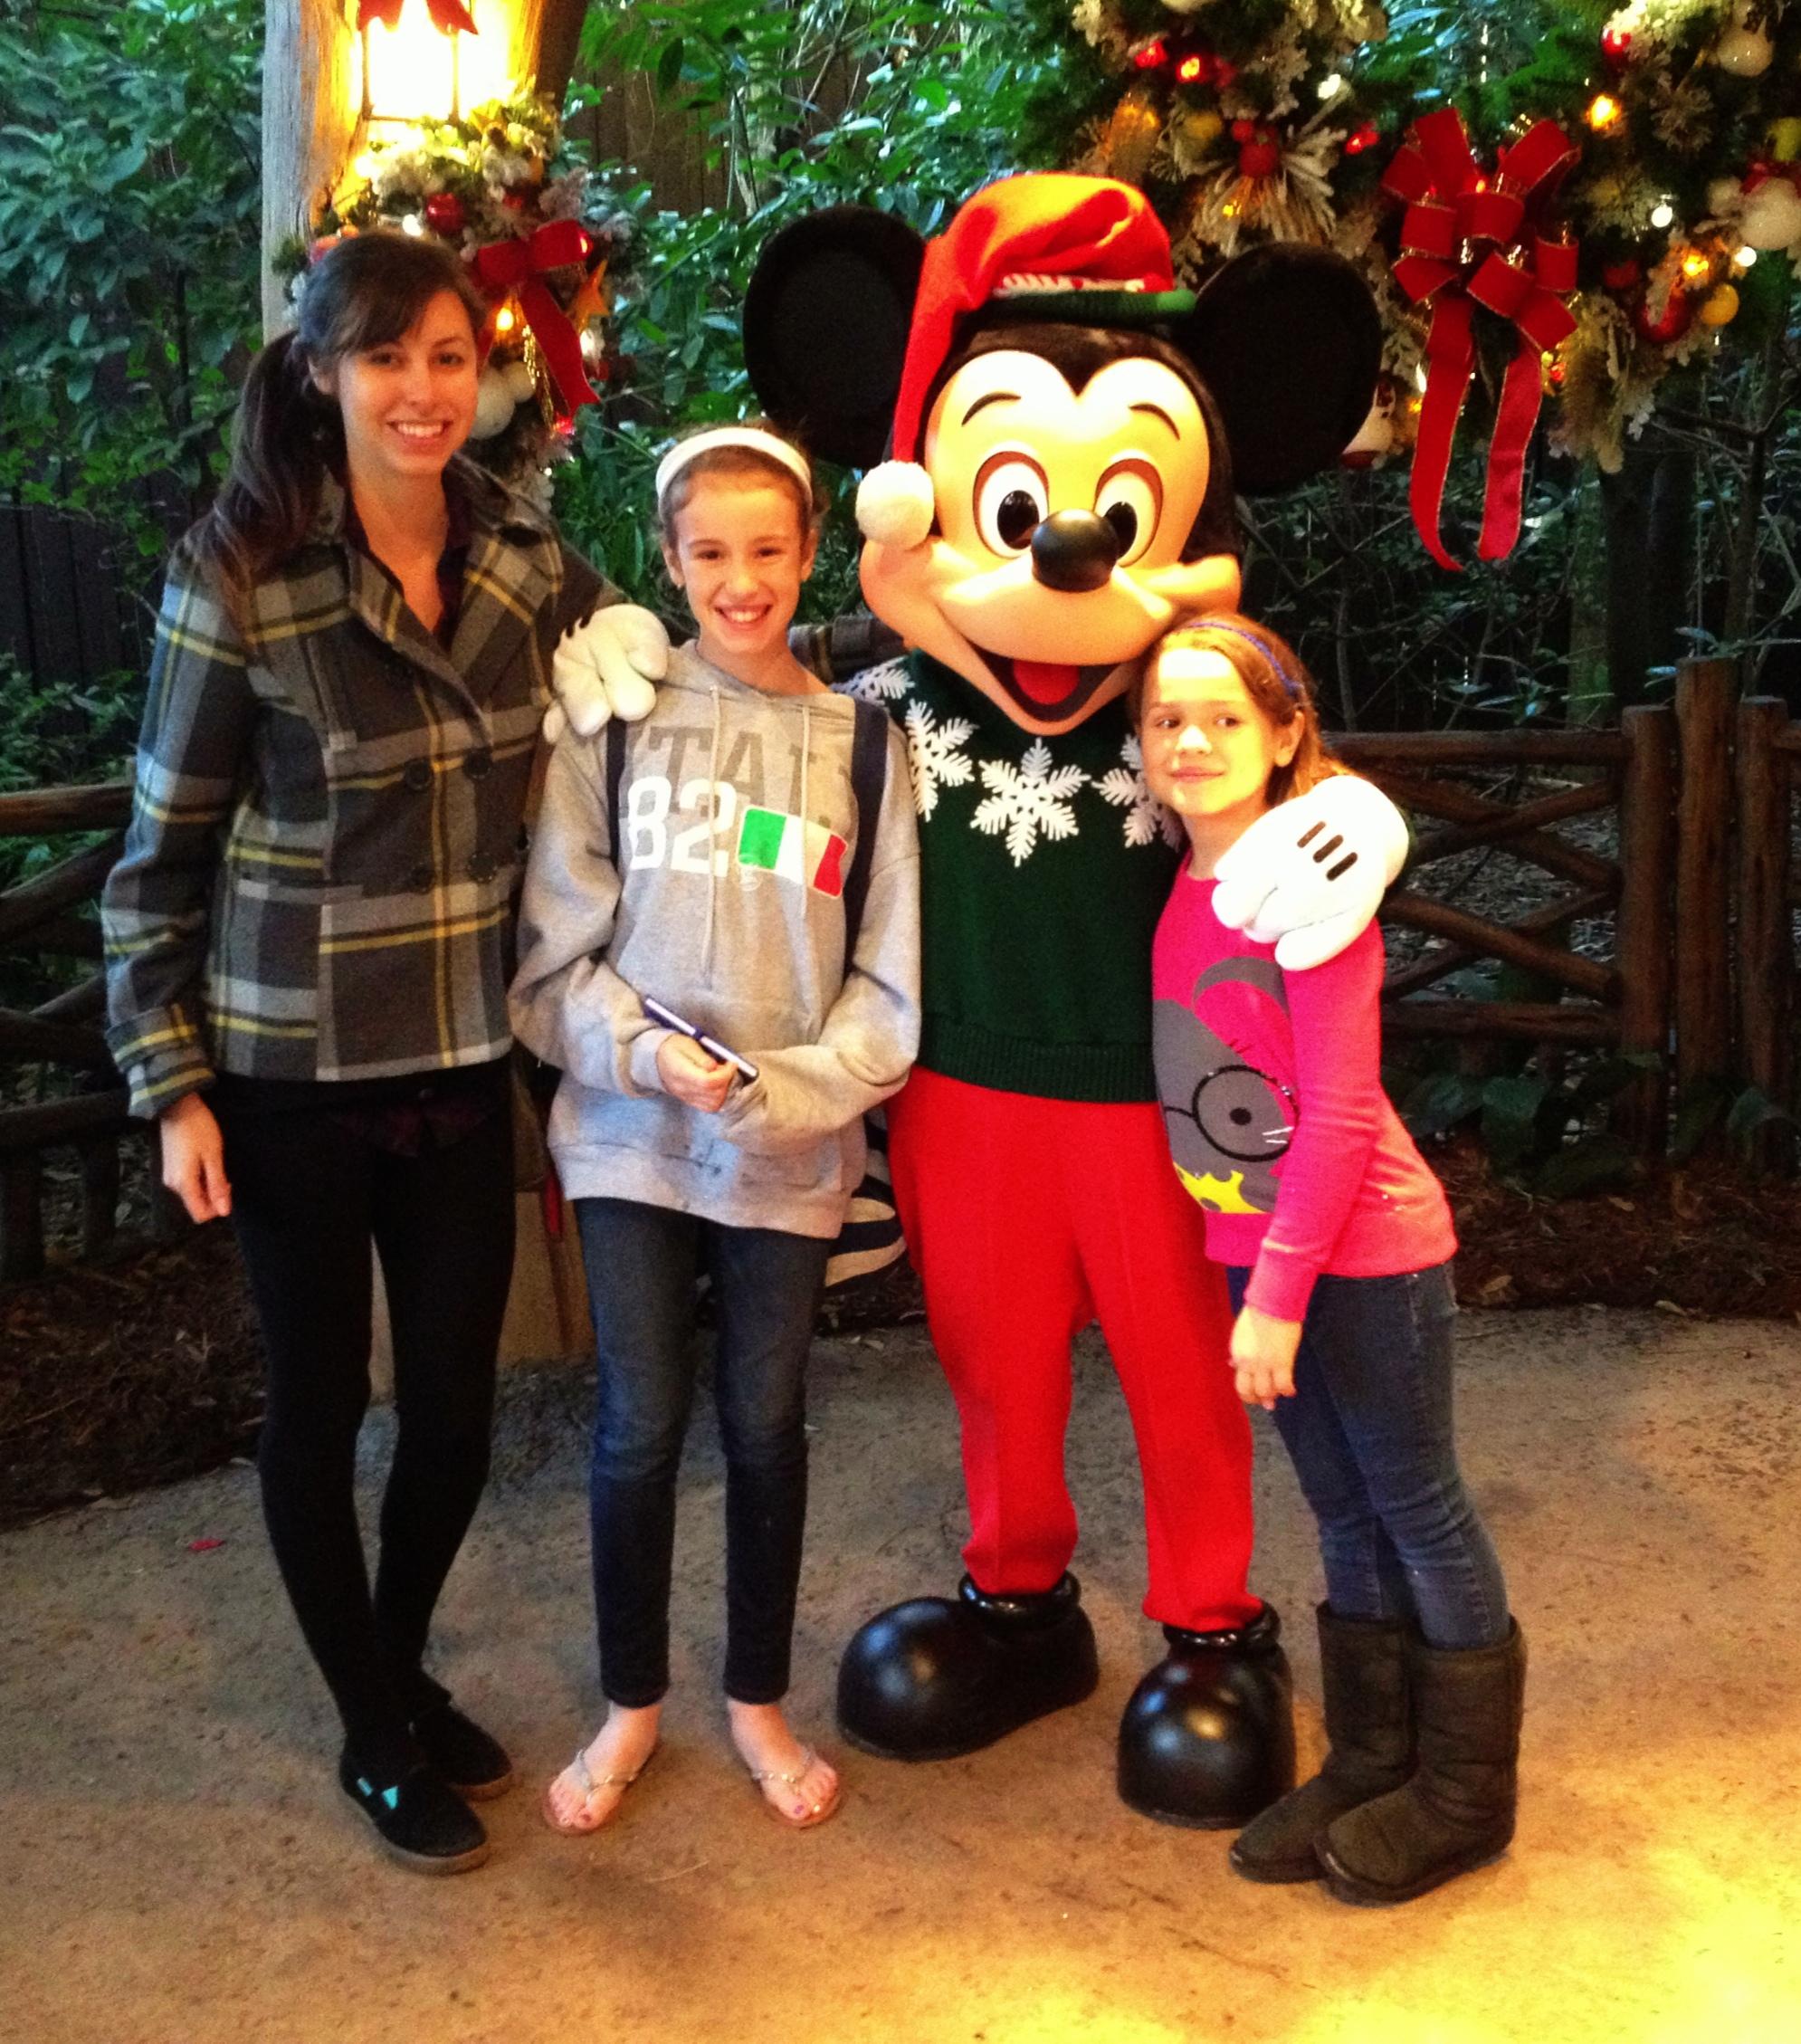 Disneyworld, Orlando Florida 2013